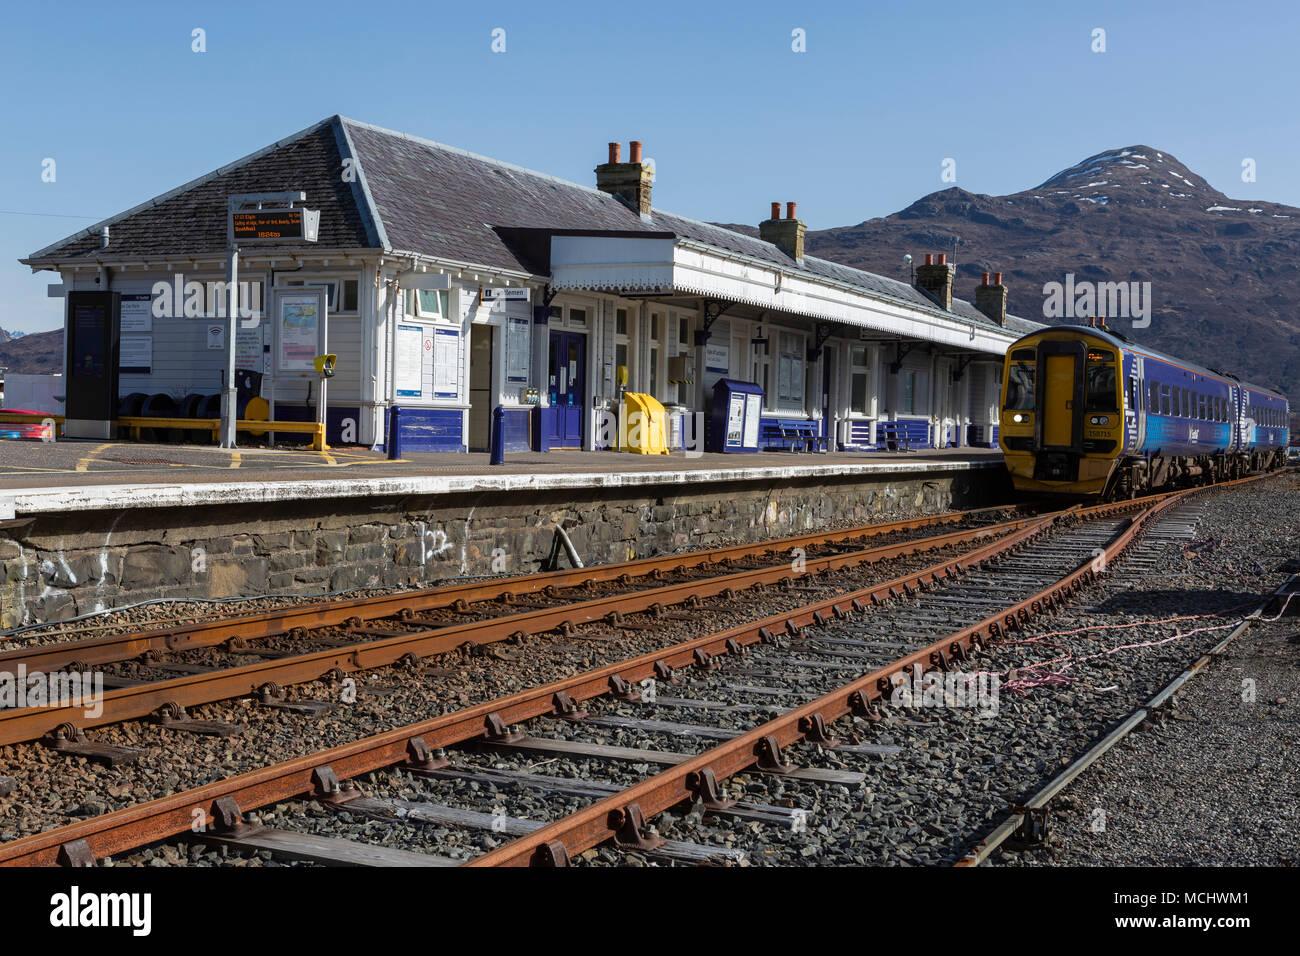 ScotRail diesel electric train waiting at Kyle of Lochalsh station, Highland Region, Scotland, UK - Stock Image